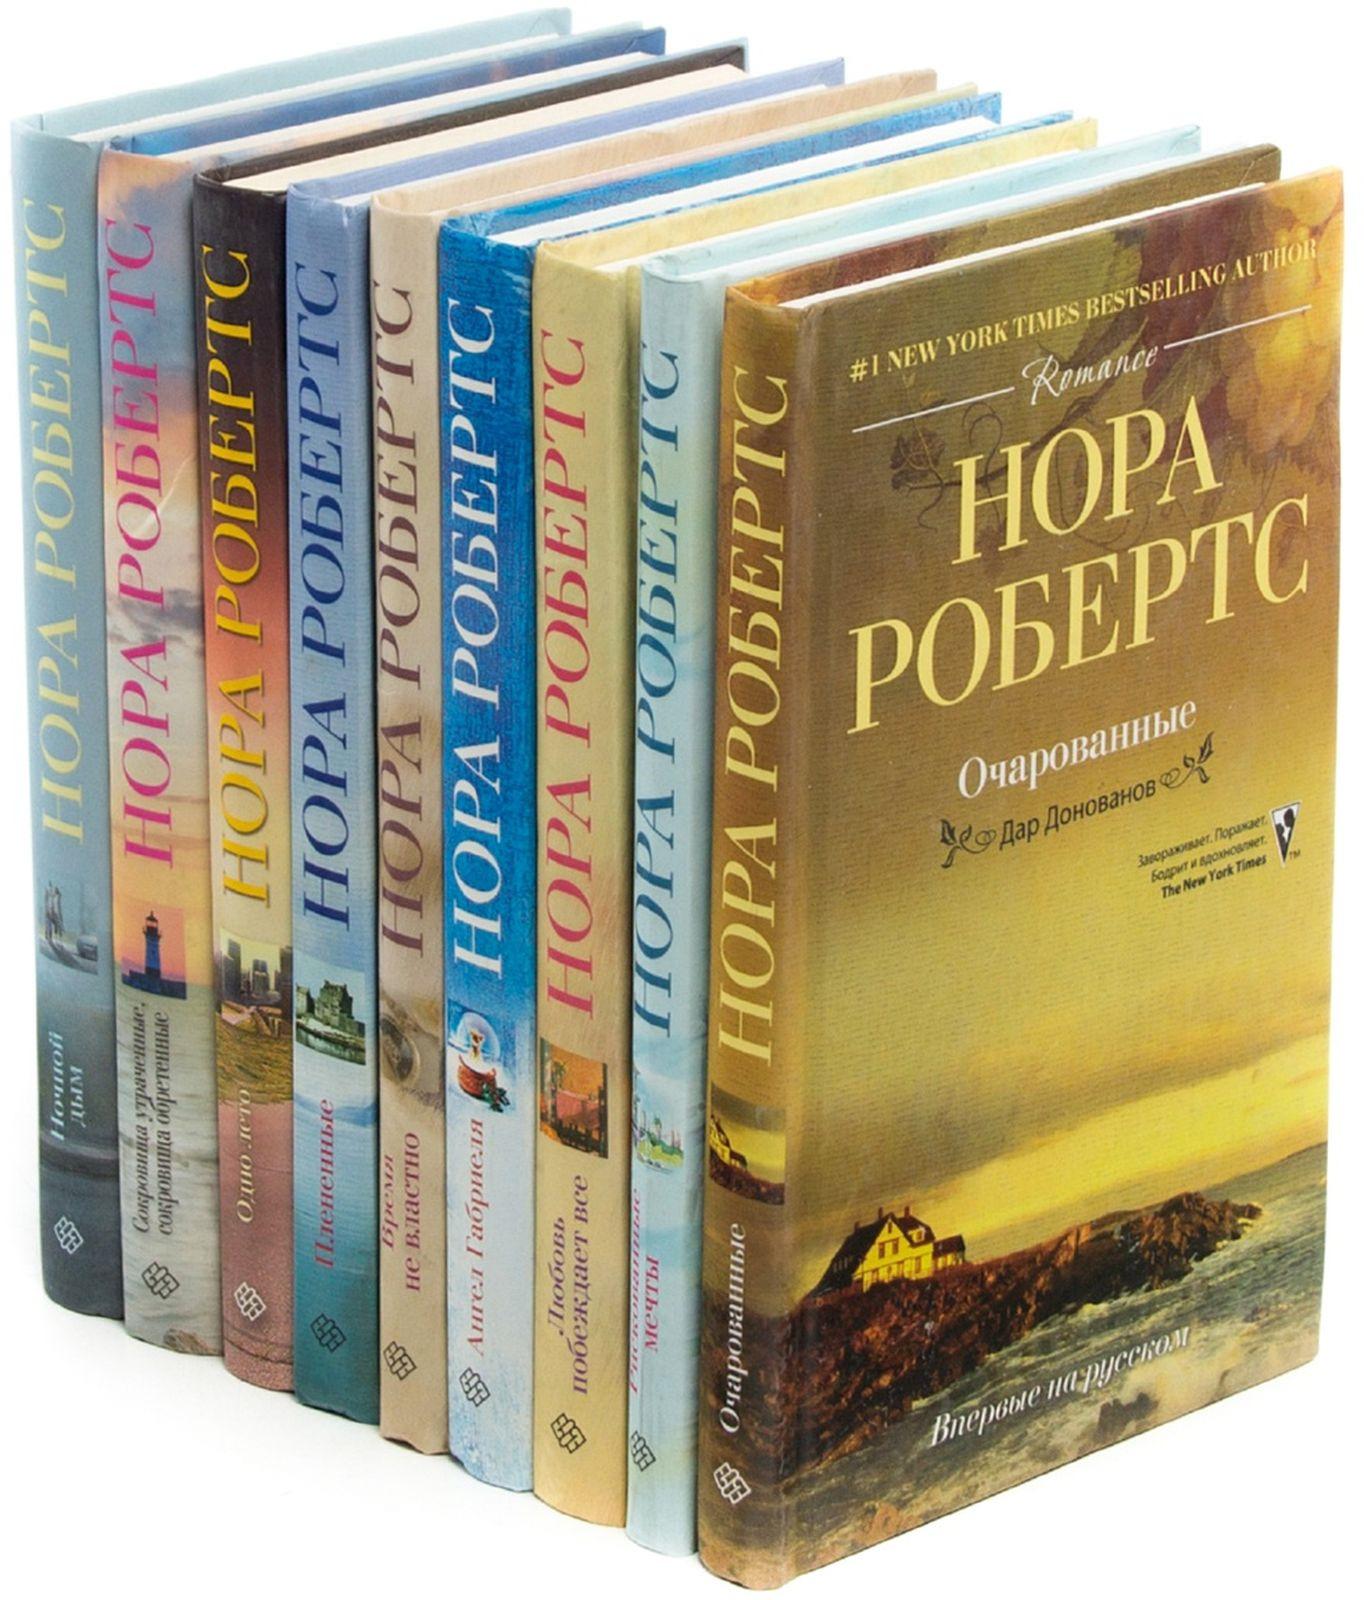 "Нора Робертс Нора Робертс. Серия ""#1 New York Times - Bestselling Author"" (комплект из 9 книг)"